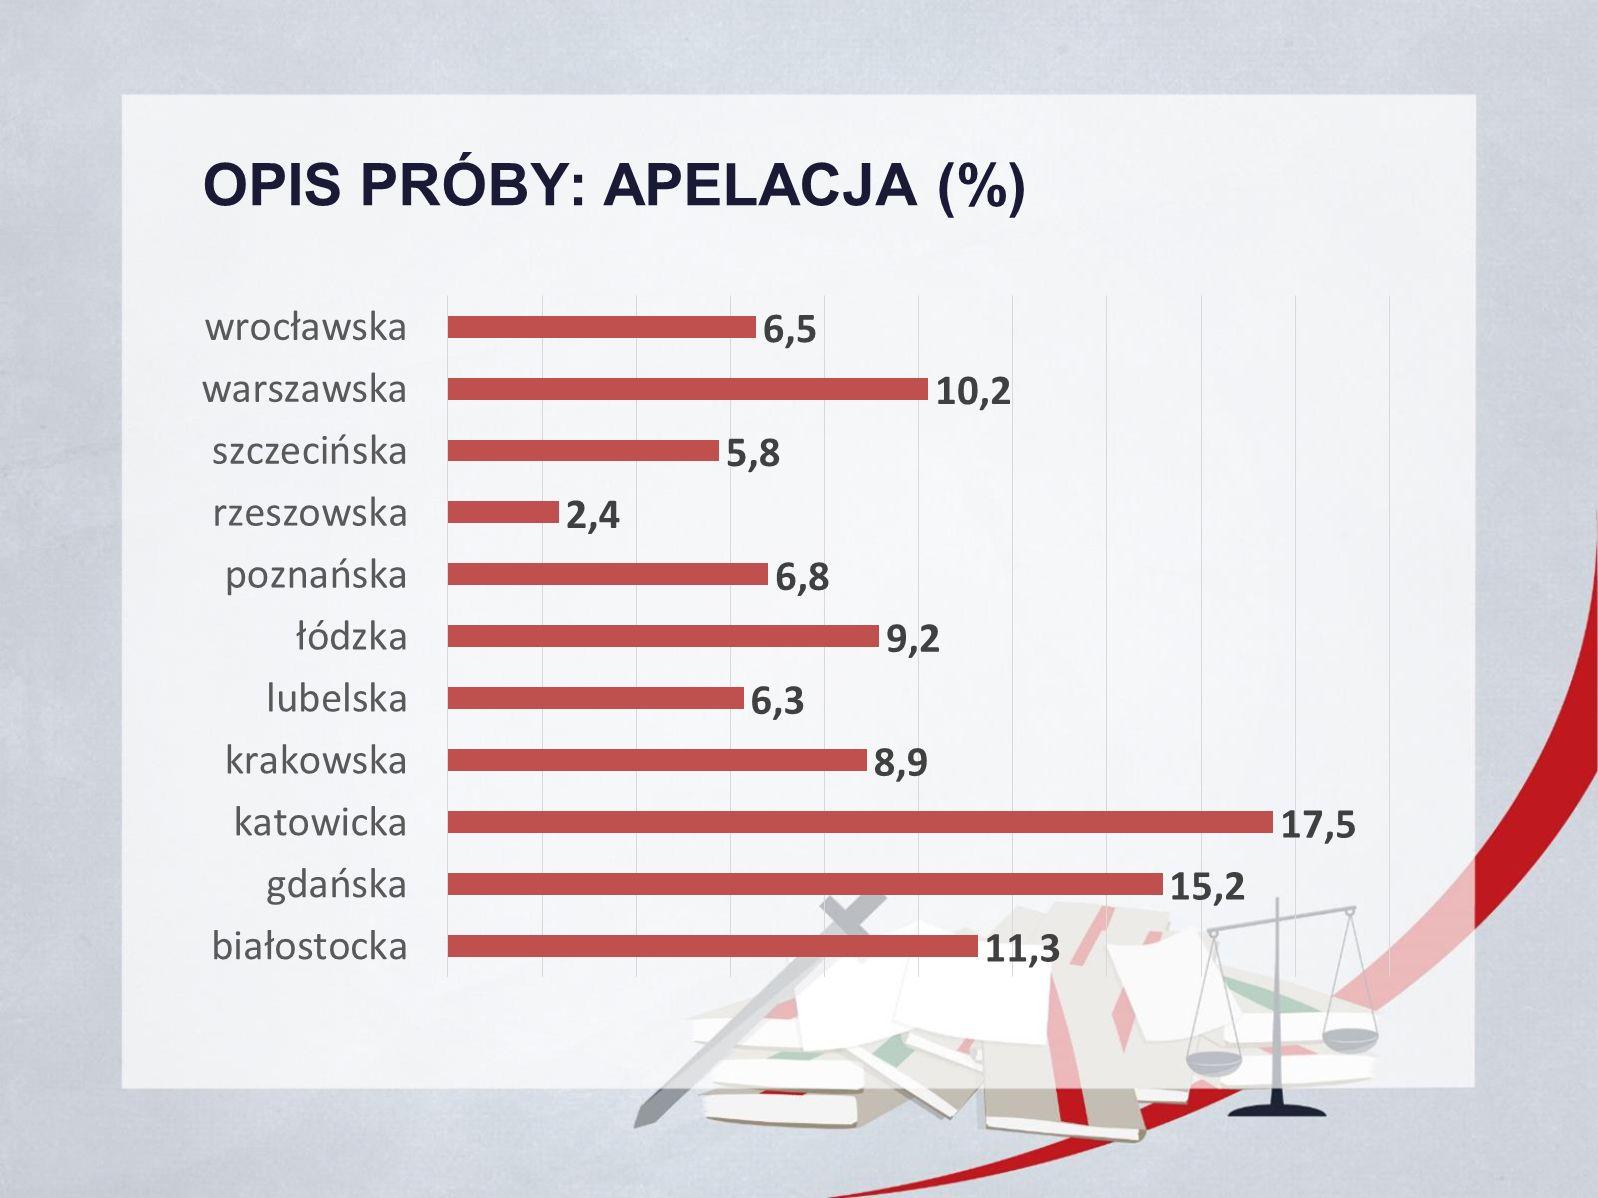 OPIS PRÓBY: APELACJA (%)